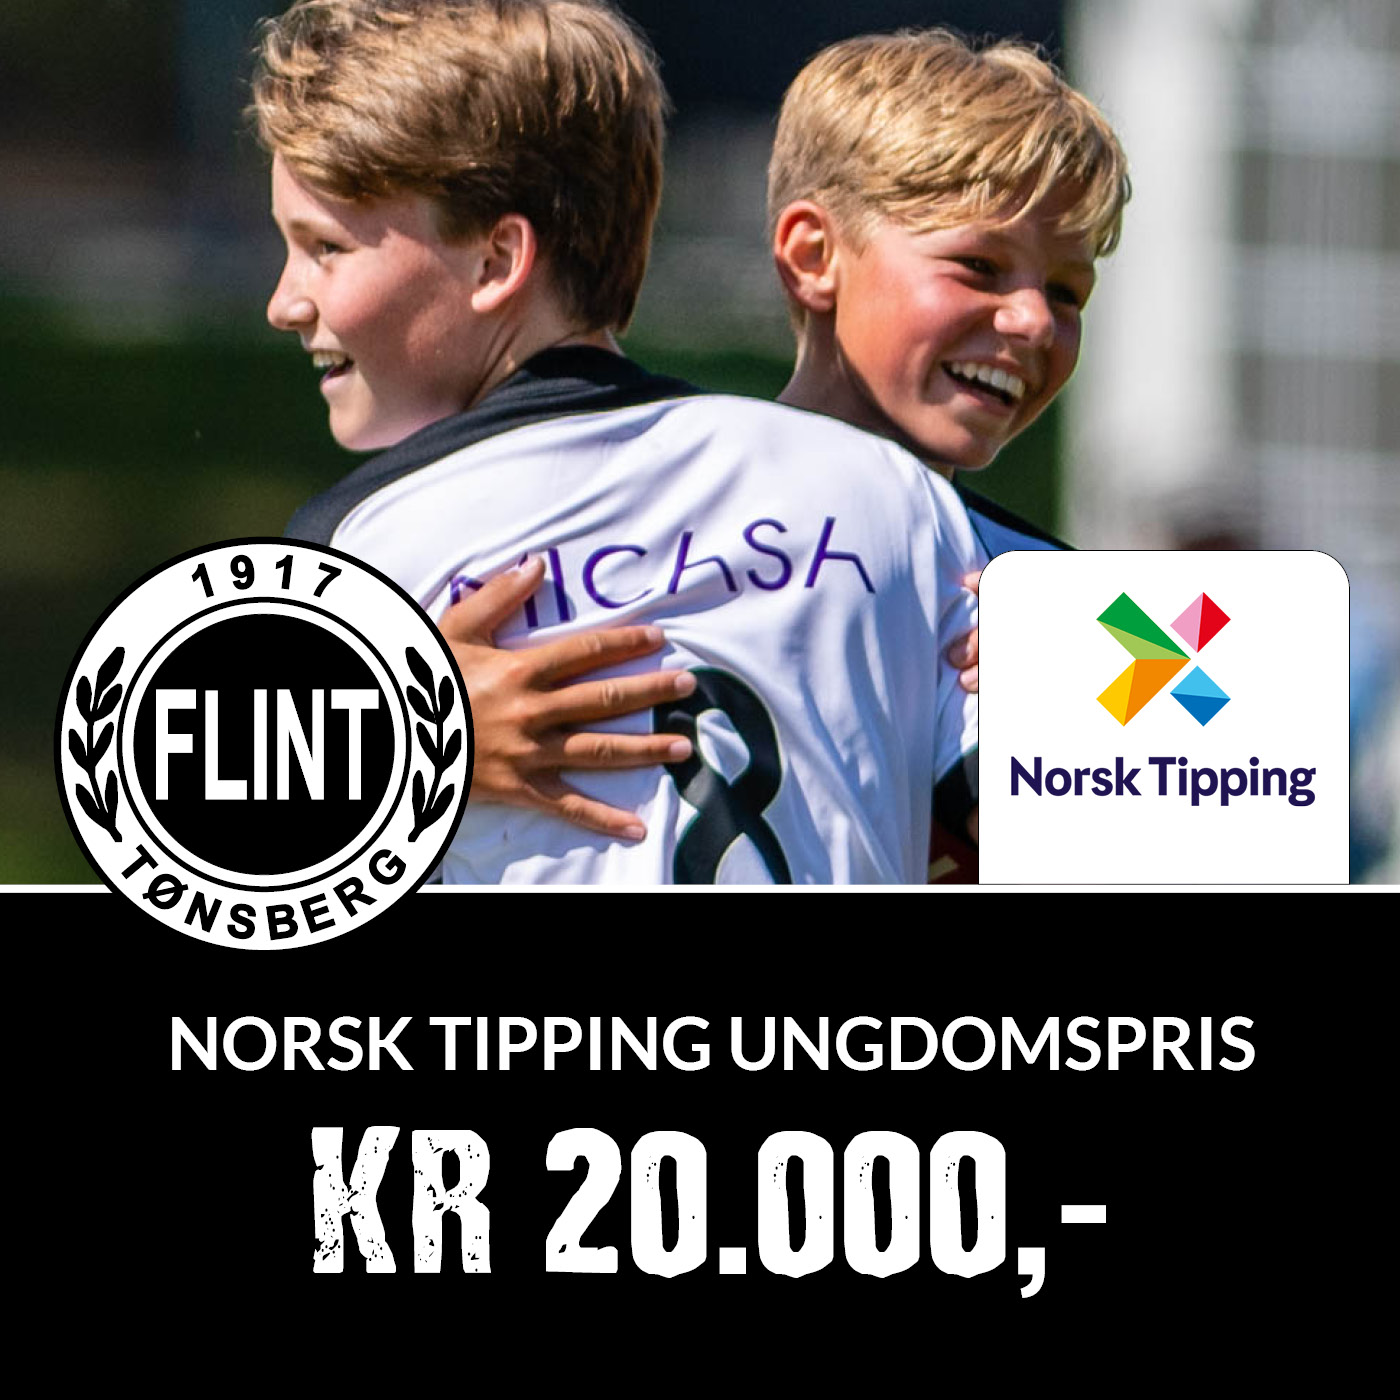 https://www.flintfotball.no/wp-content/uploads/2020/12/Norsk-Tipping-ungdomspris.jpg